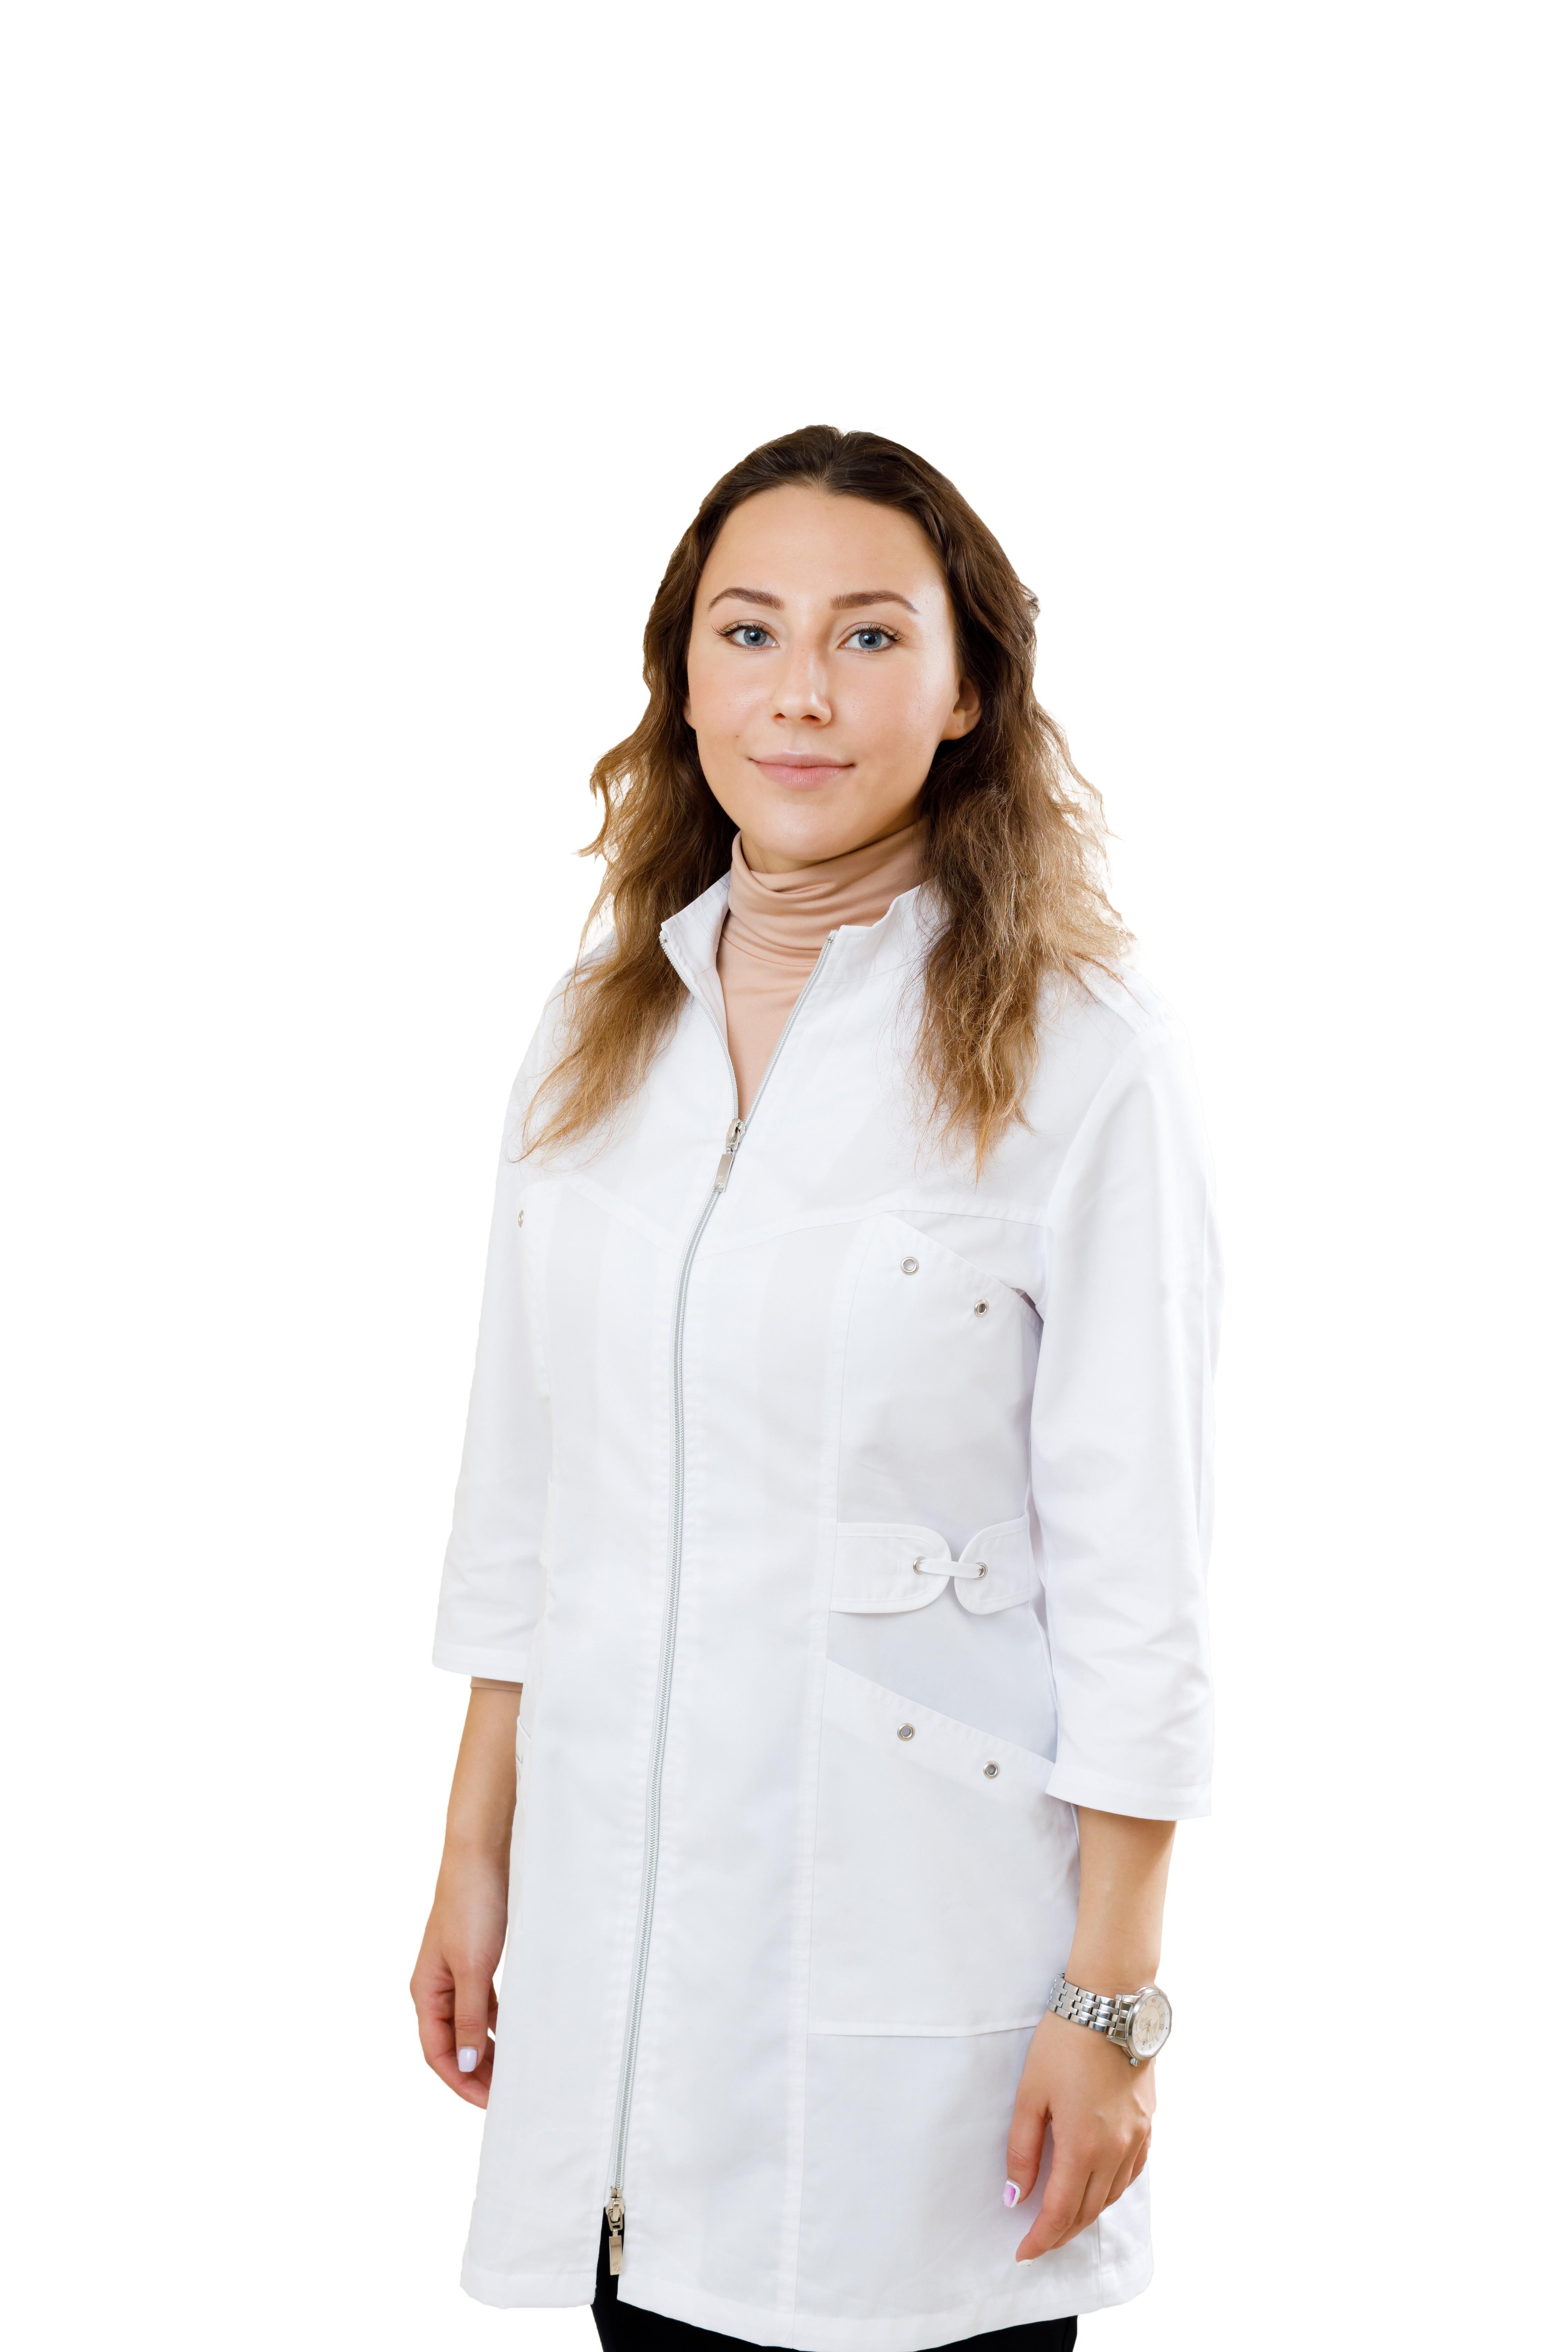 Анна Прокофьева,  медицинский п...